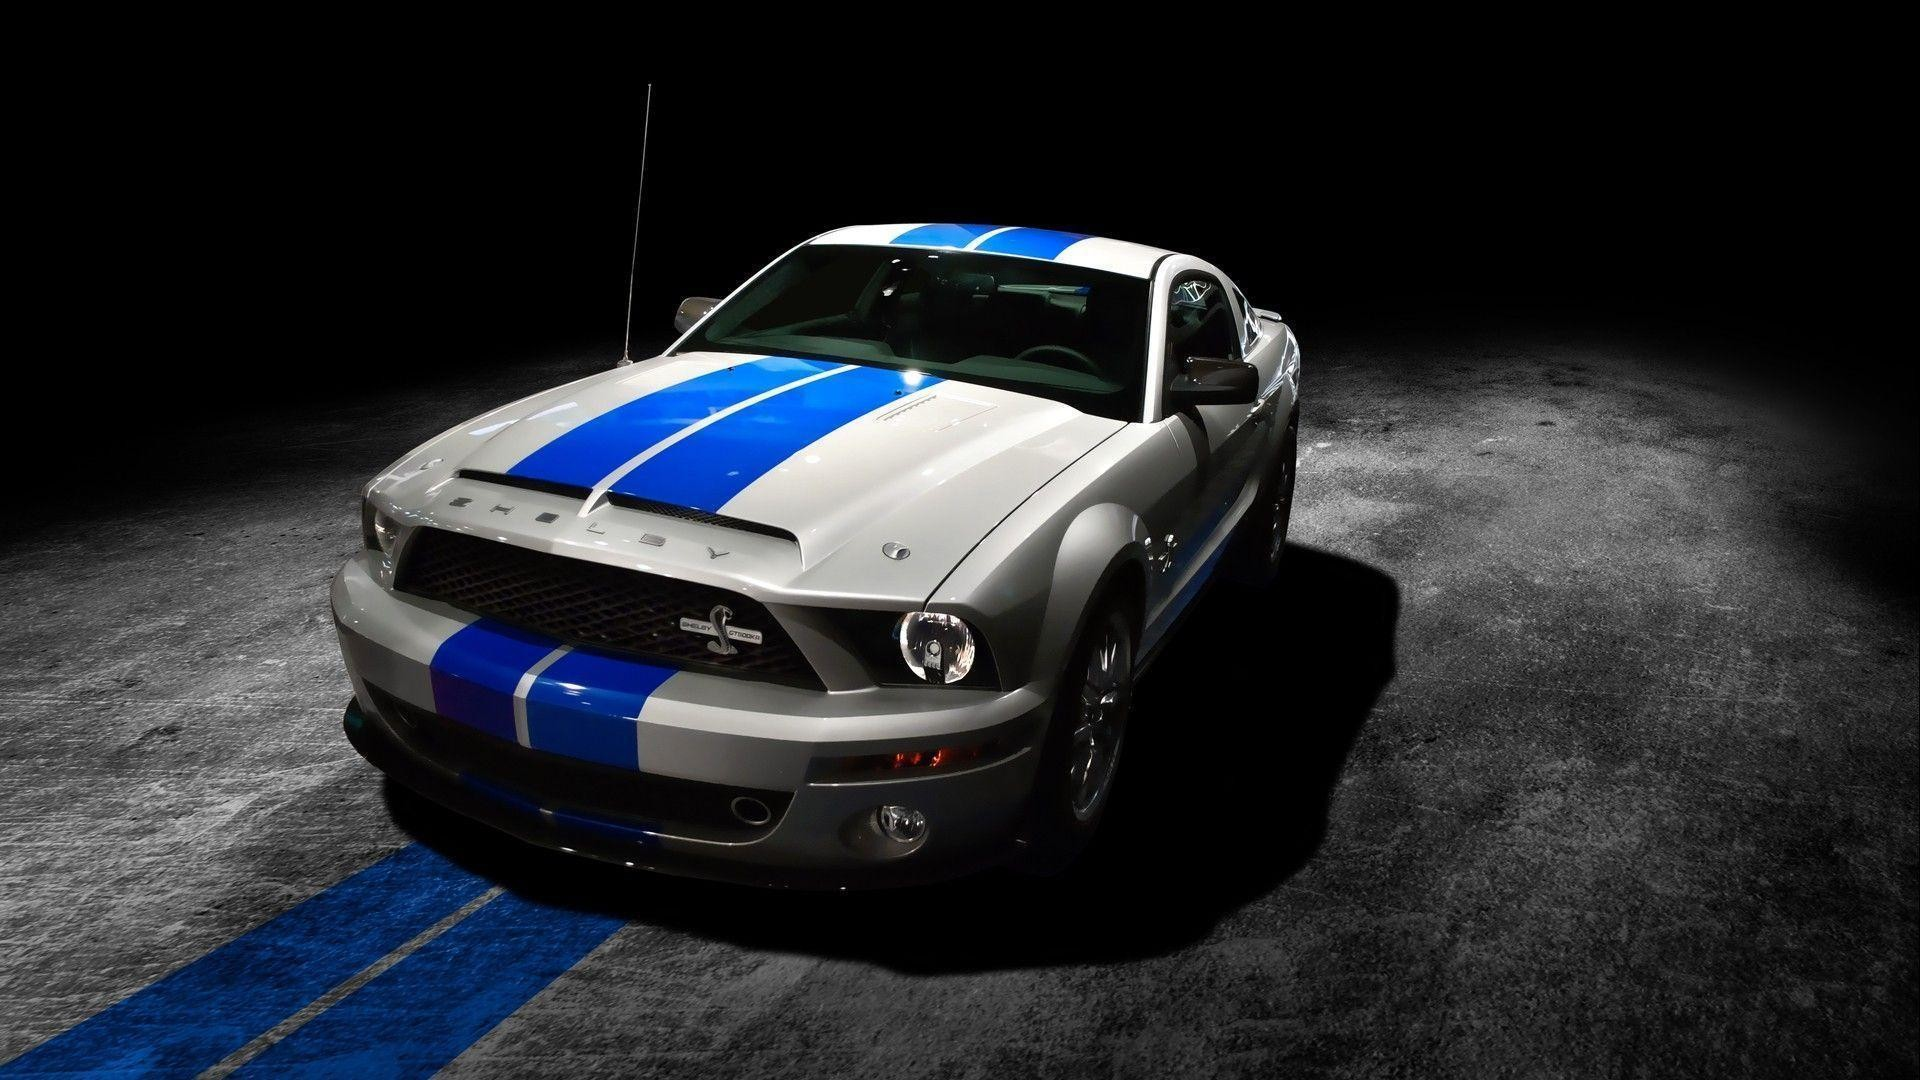 Muscle Car Wallpaper – Desktop Wallpaper, HD Wallpapers, Wallpaper .